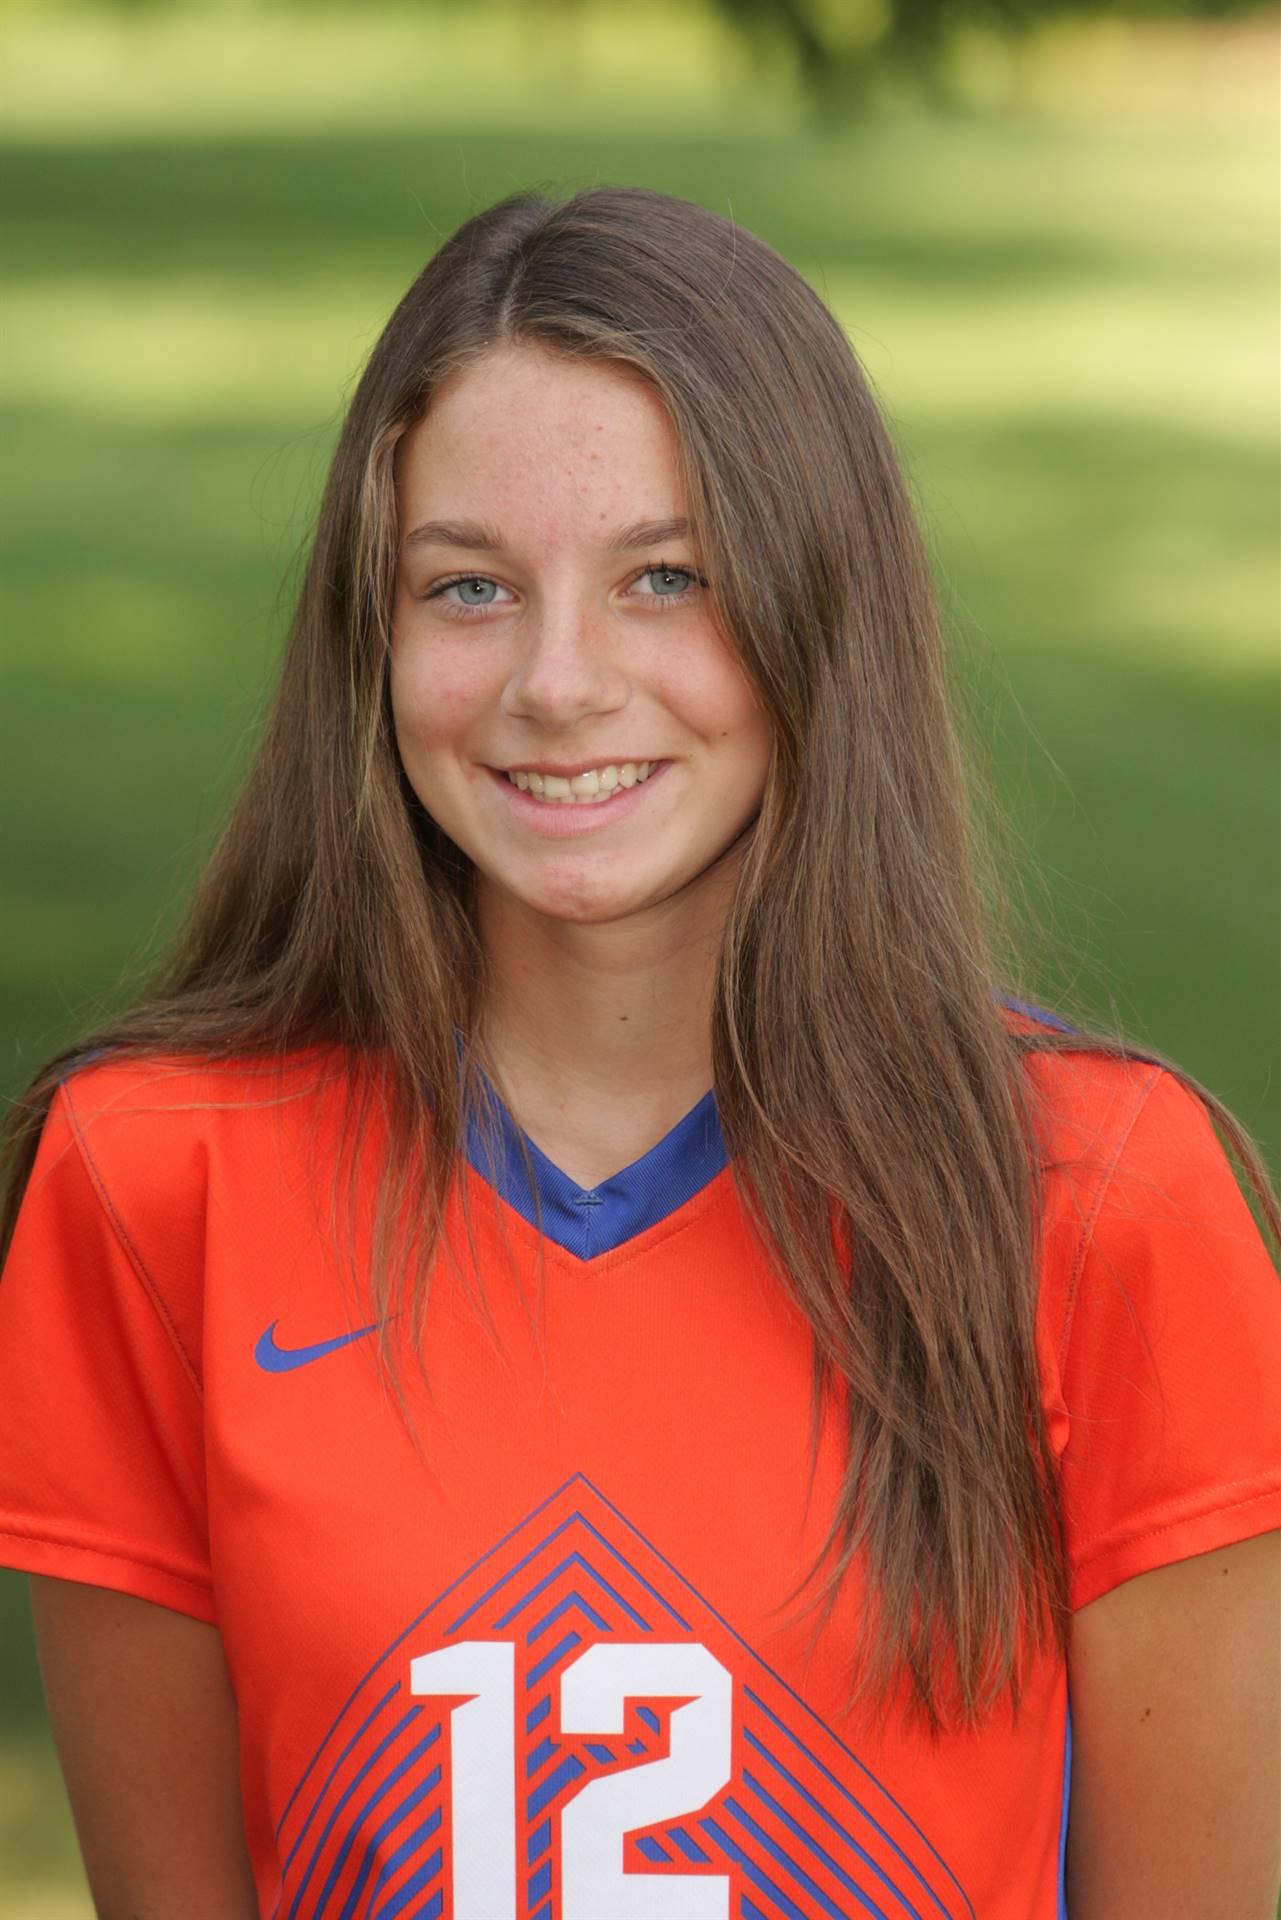 Livia Lowrey